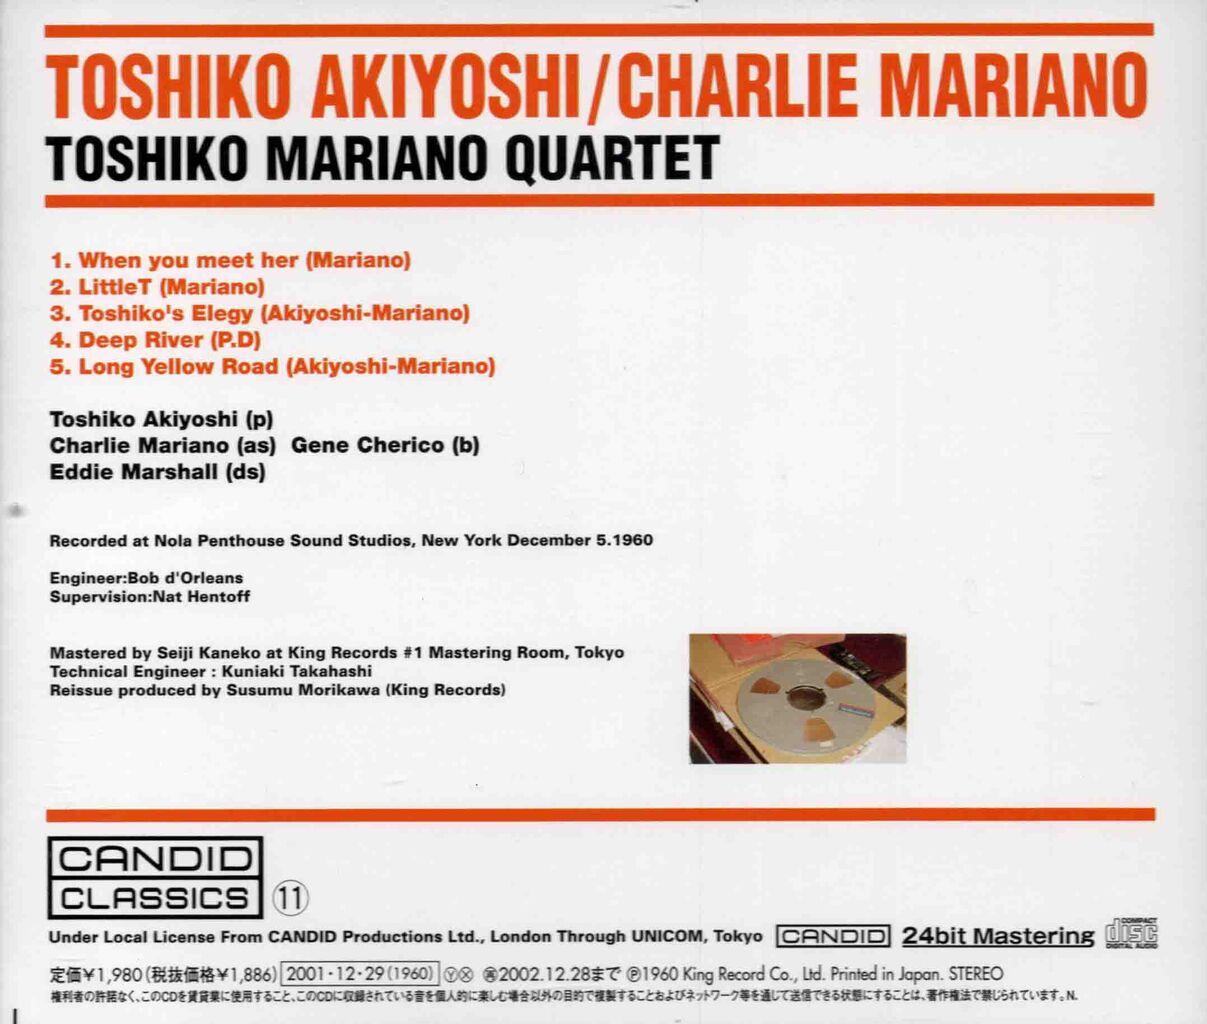 TOSHIKO MARIANO QUARTET-2